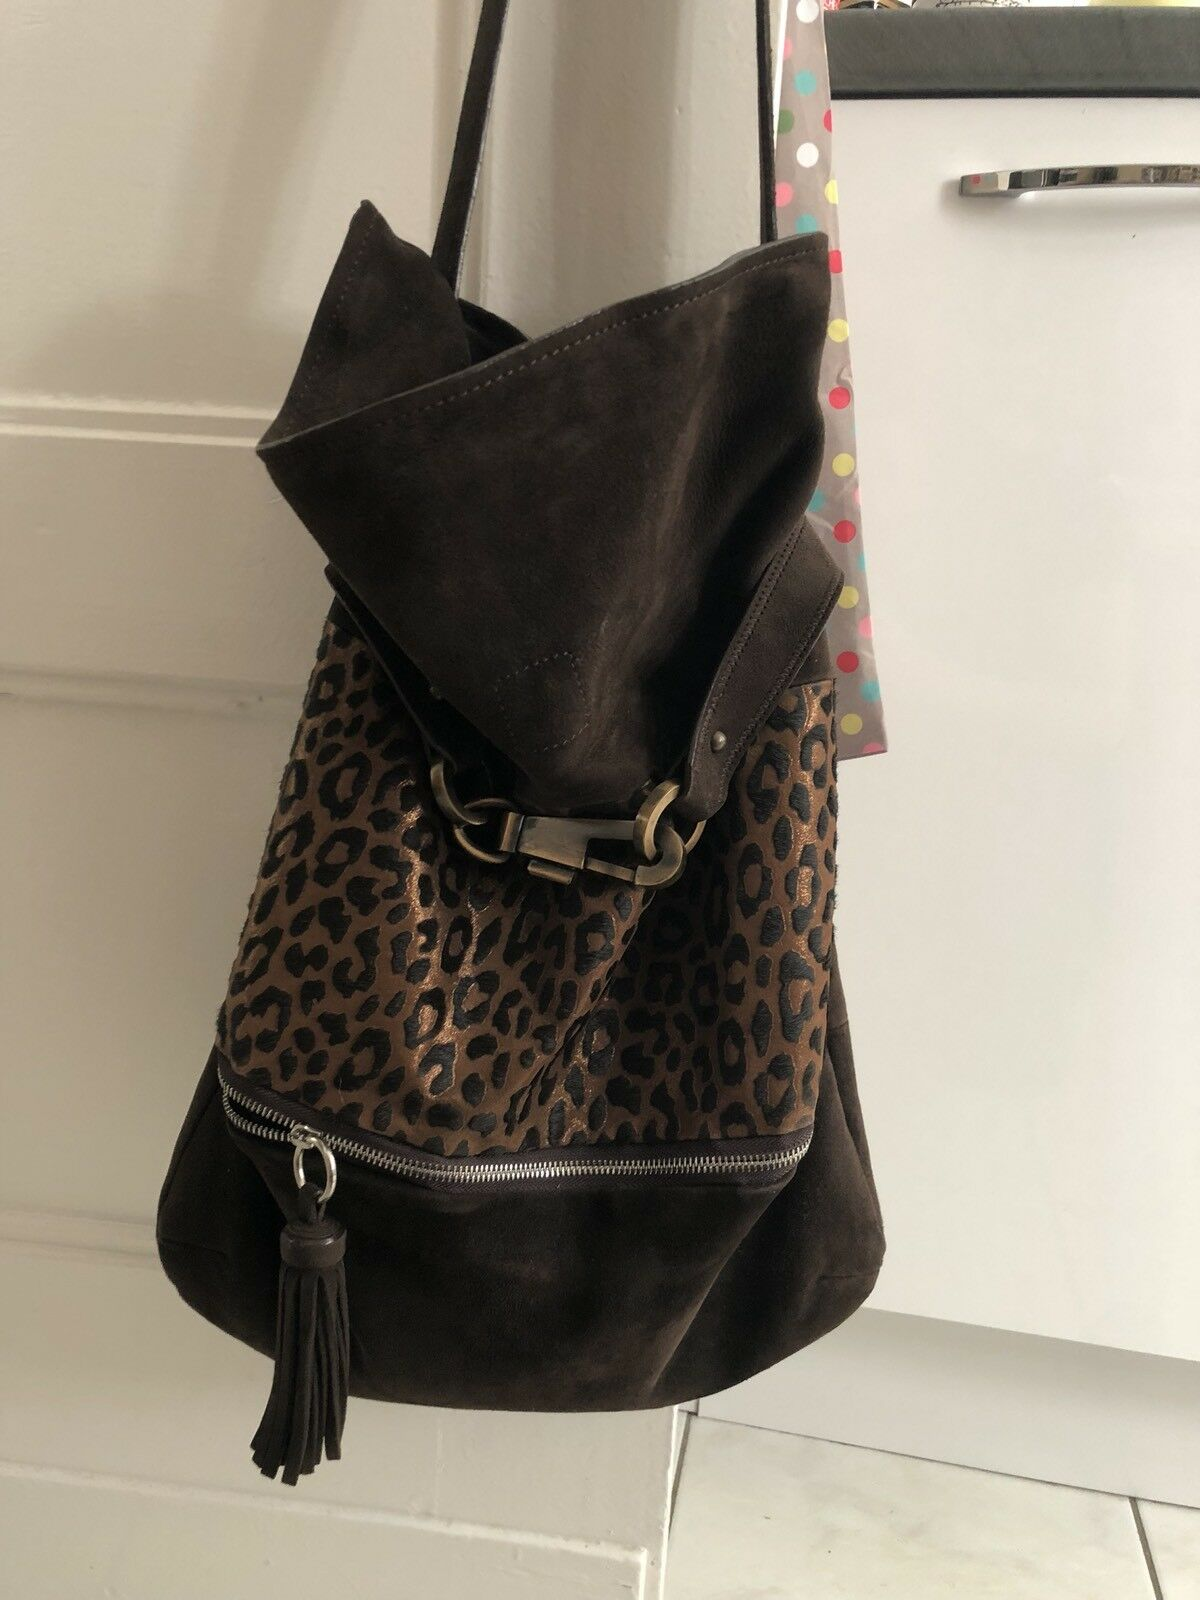 Echtleder Handtasche       Große Auswahl    Neue Sorten werden eingeführt    Online Outlet Store  ecea35